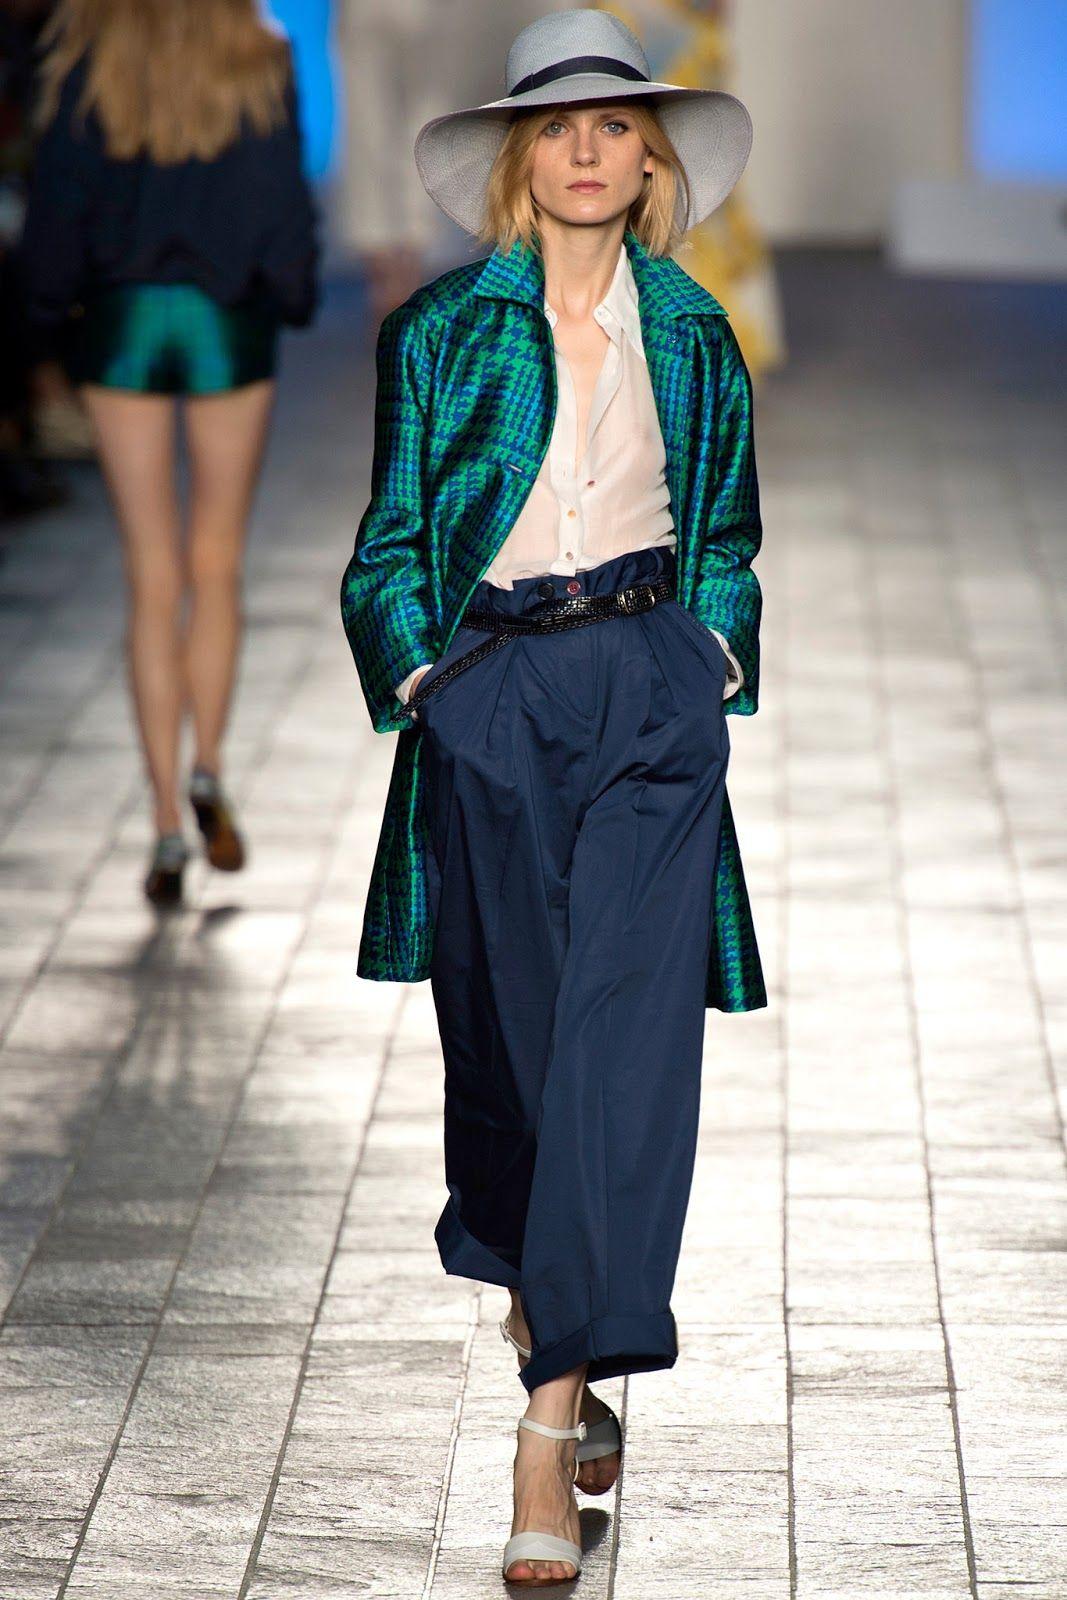 Paul Smith SpringSummer 2014 RTW – London Fashion Week